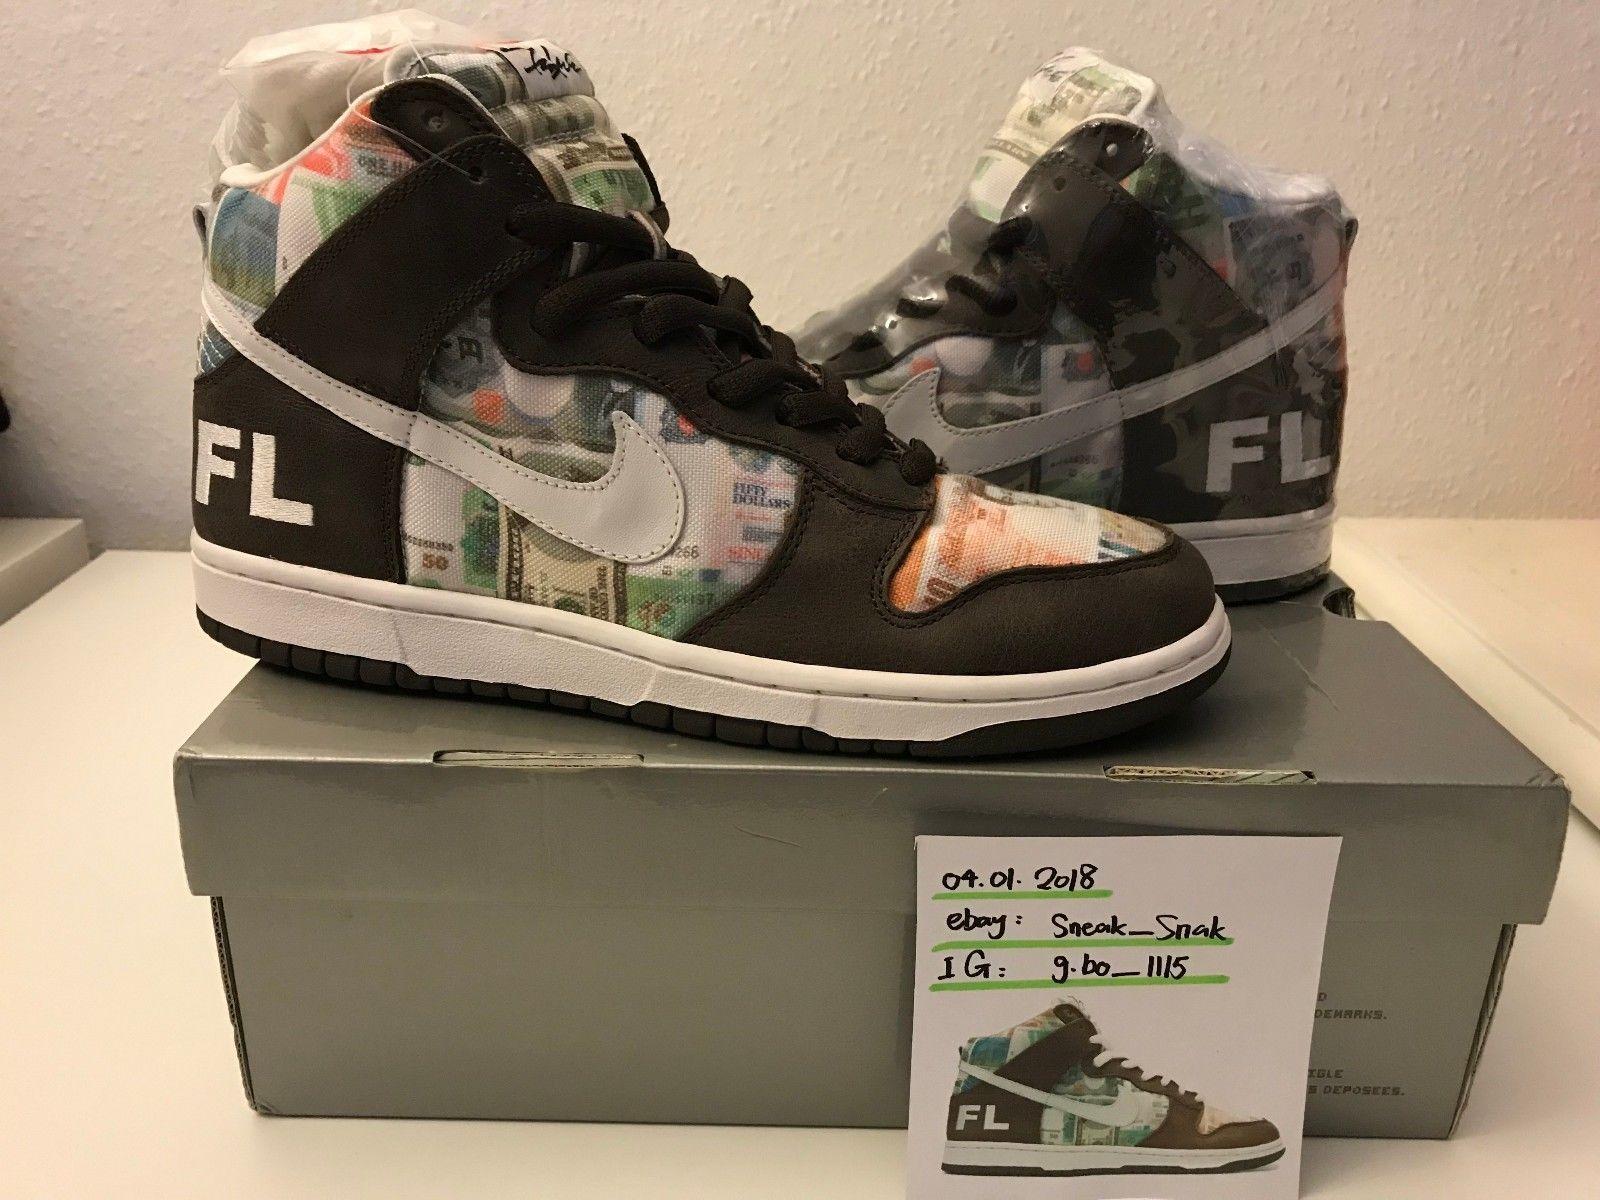 timeless design 406e8 5052a Nike Dunk High Pro SB For Love Or Money FLOM paris london pigeon tokyo ft  sample